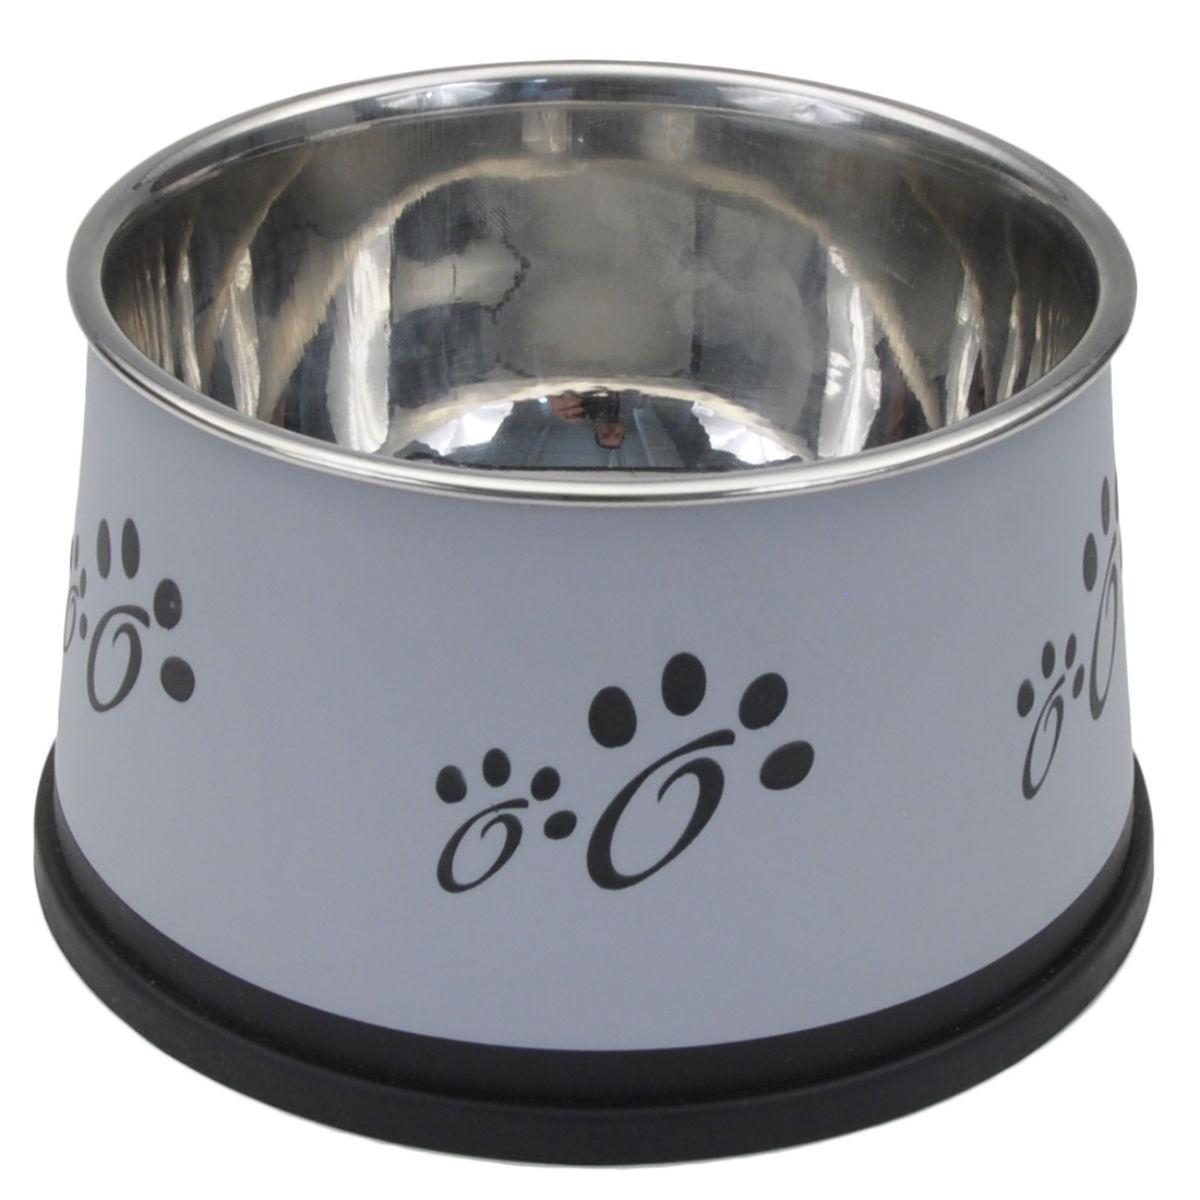 Bergan Dry Ears Dog Bowl - Maslow Design Series